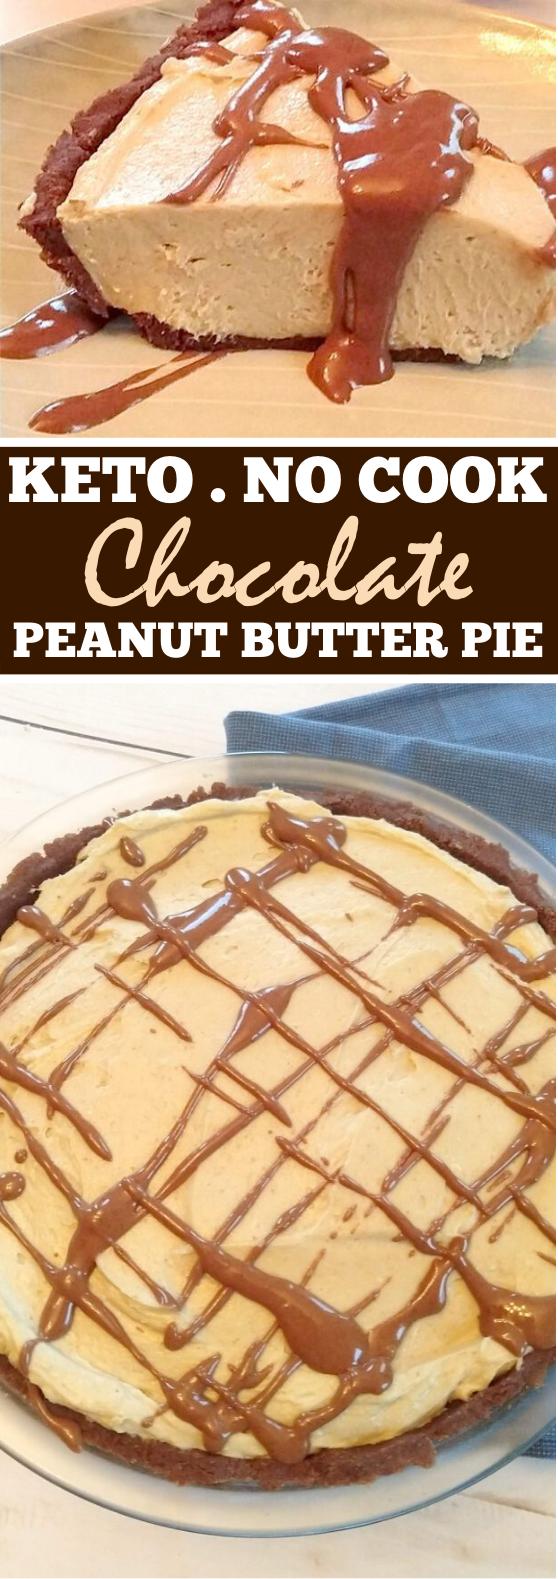 No Cook Keto Chocolate Peanut Butter Pie #lowcarb #keto #desserts #pie #nobake